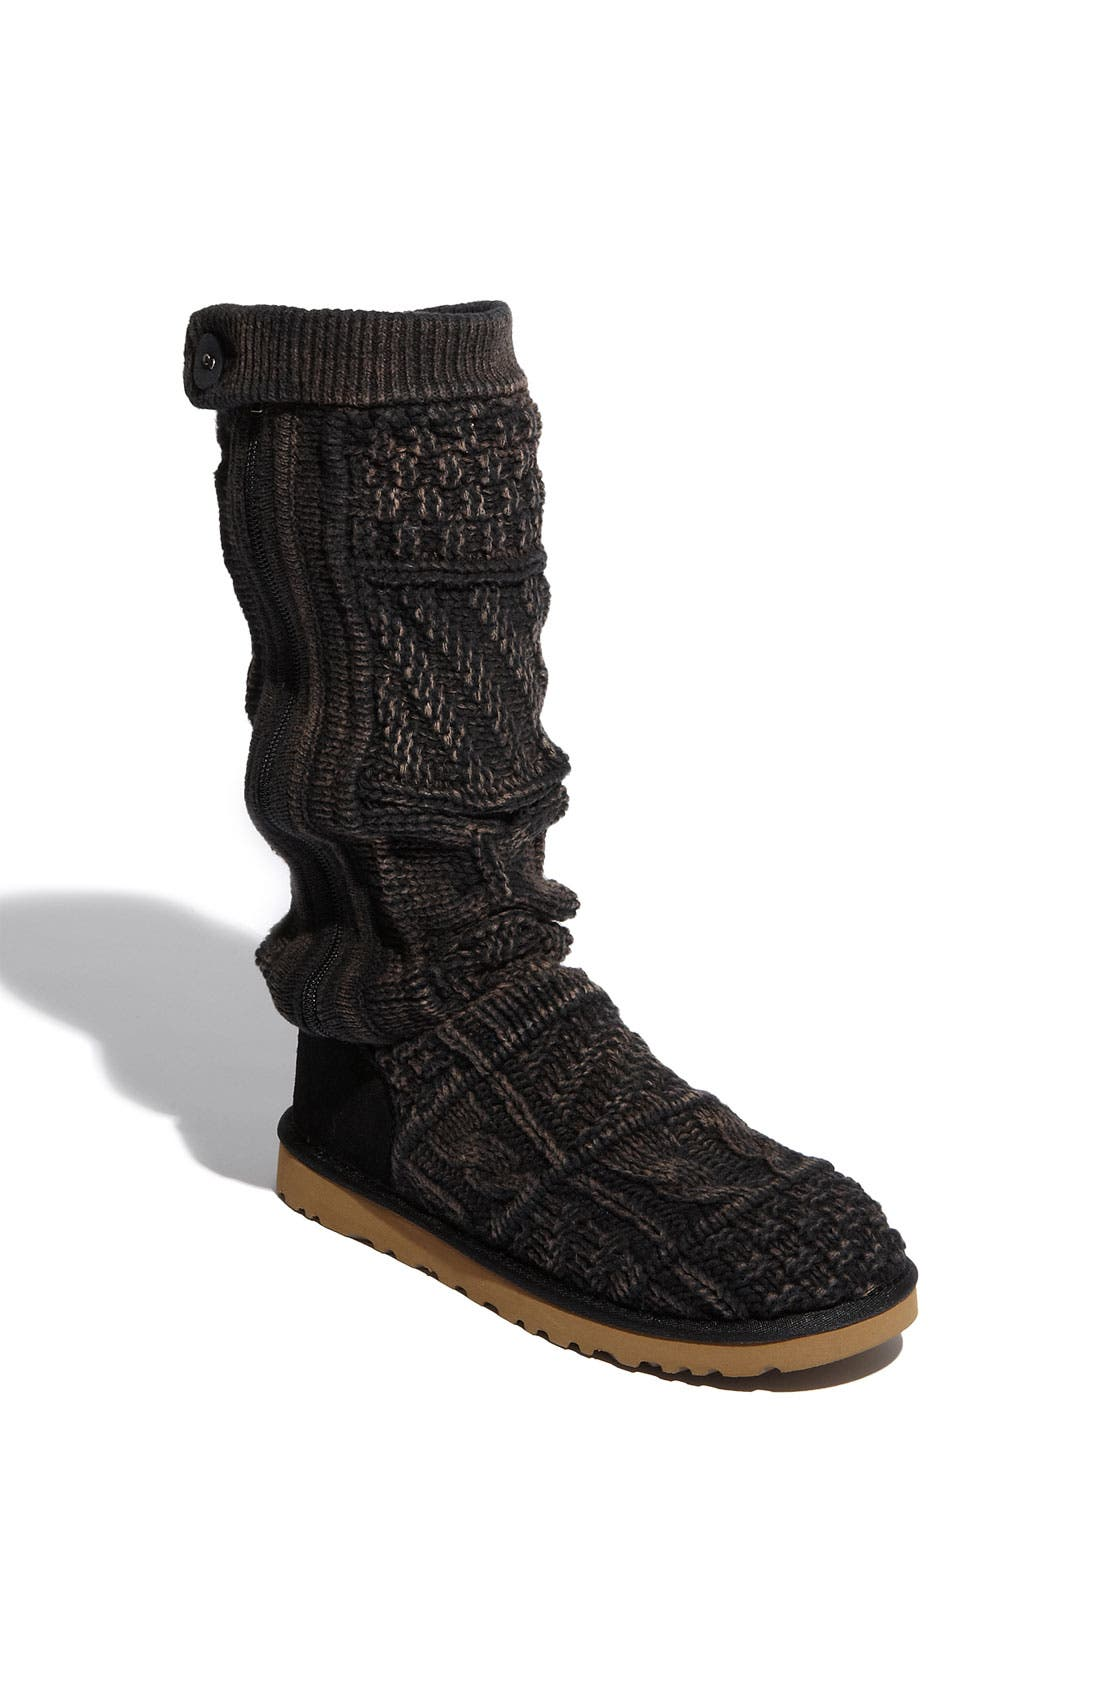 Alternate Image 1 Selected - UGG® Australia 'Patchwork' Boot